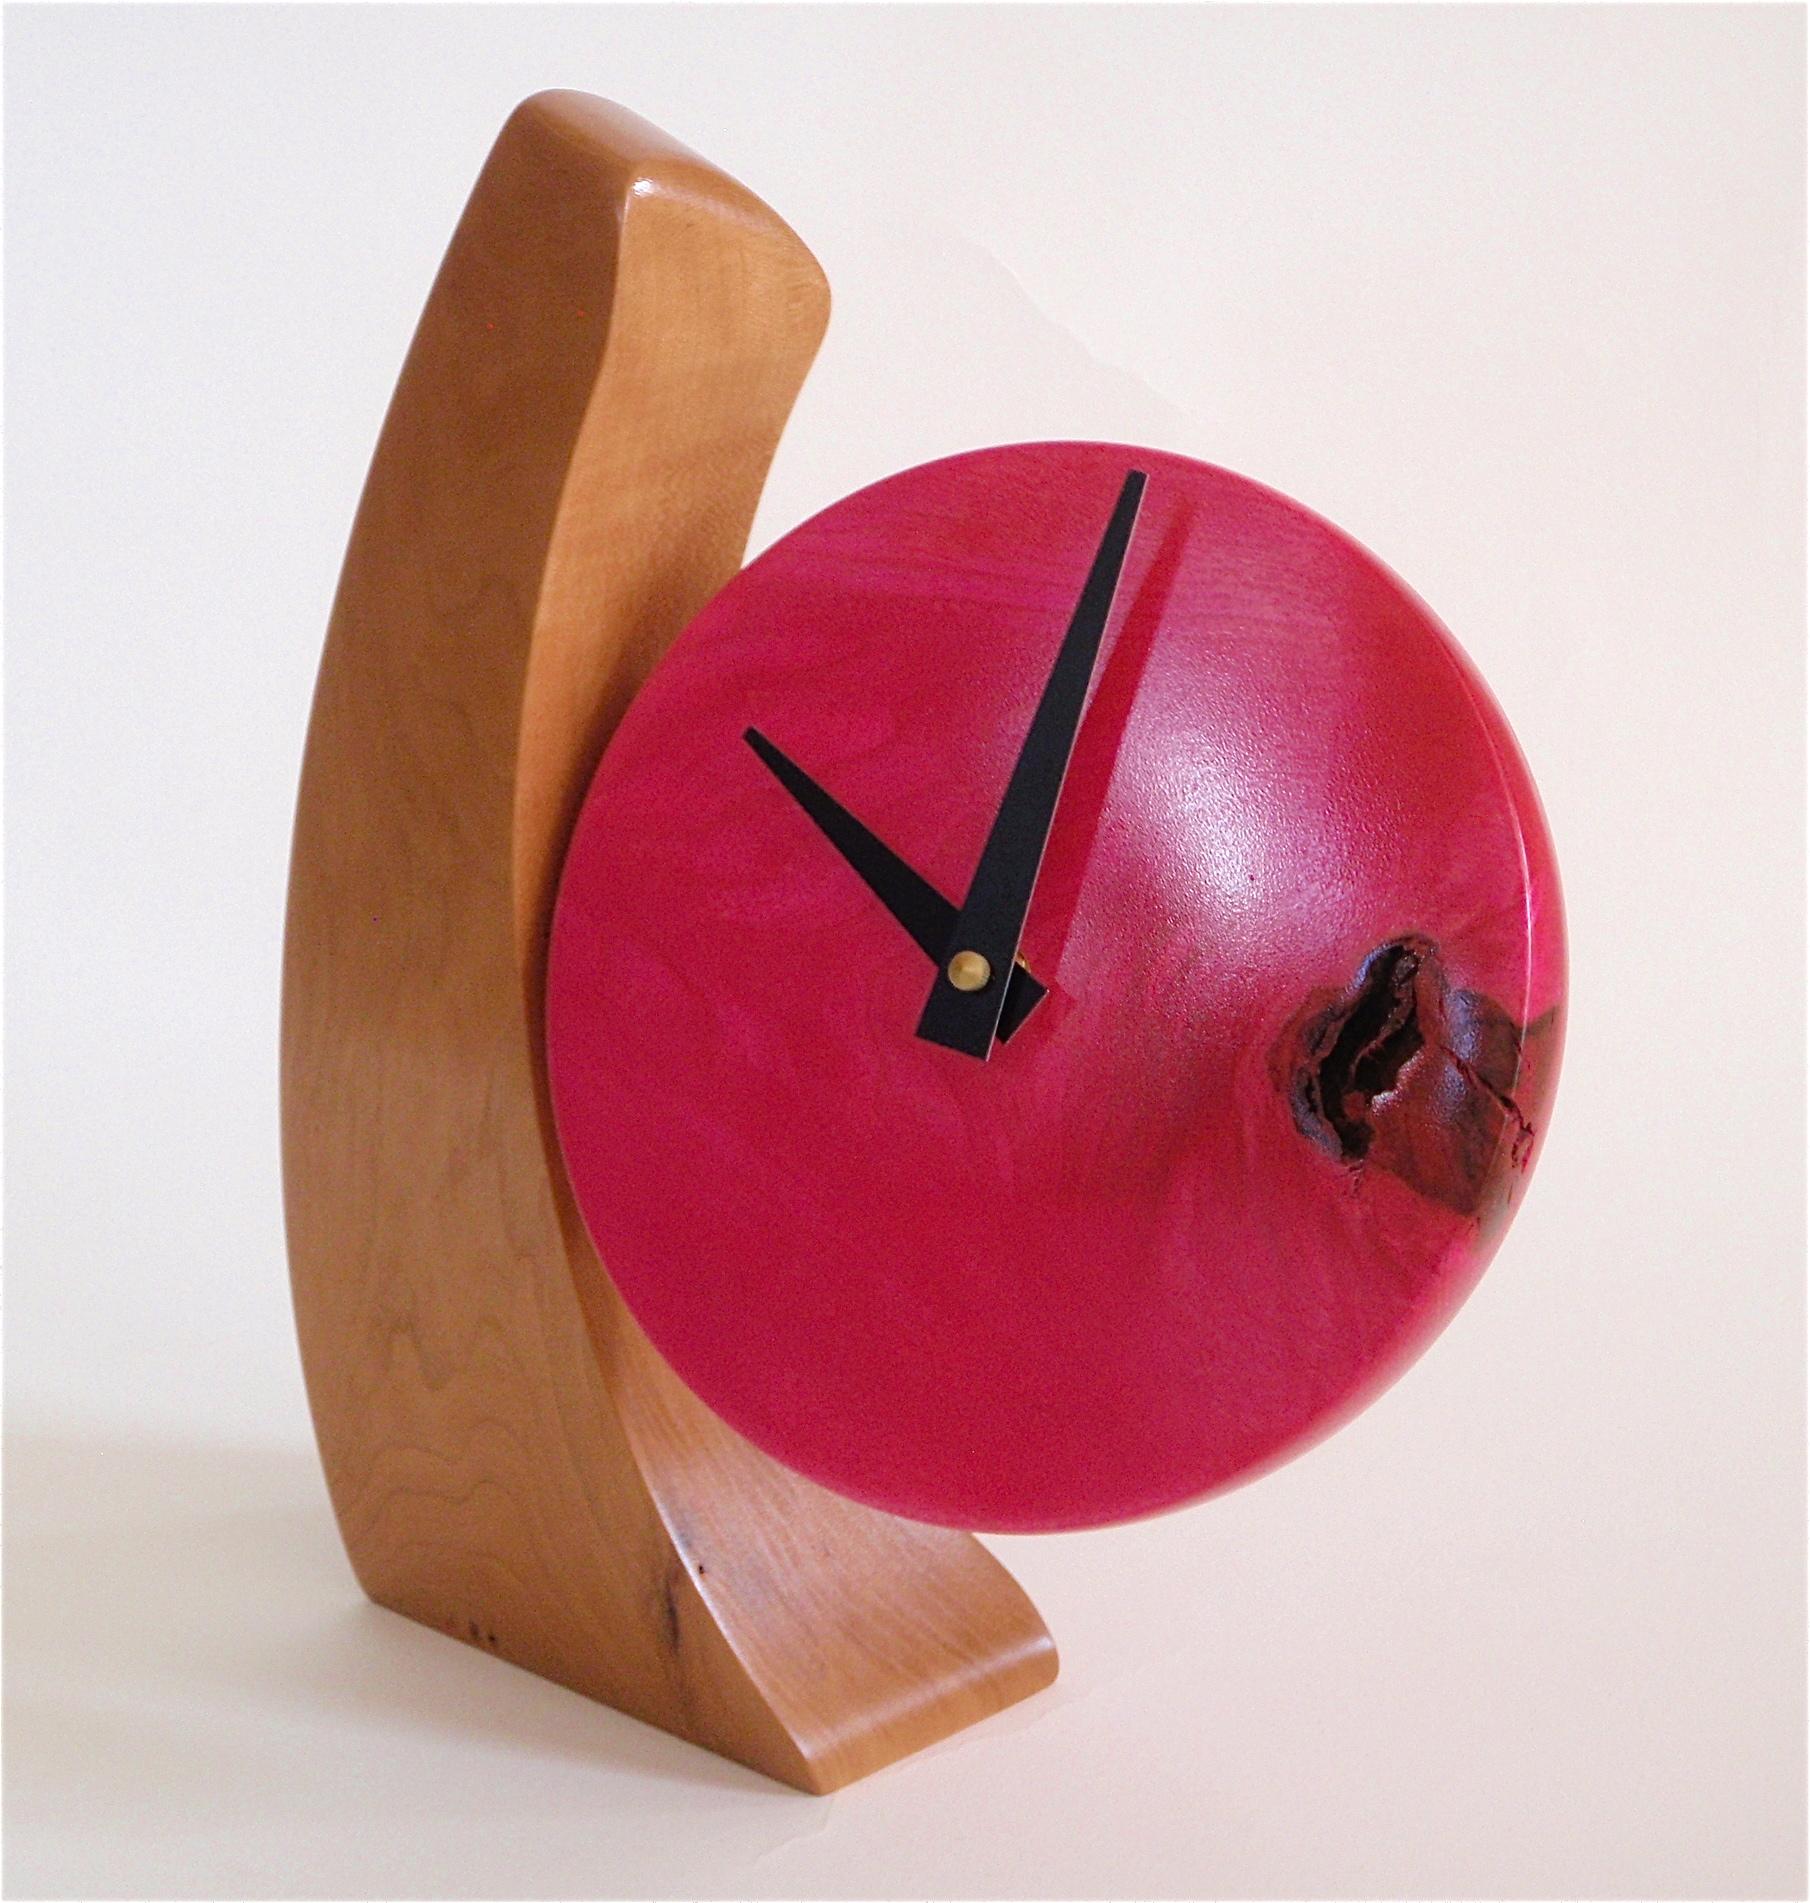 Adjustable desk clock 05